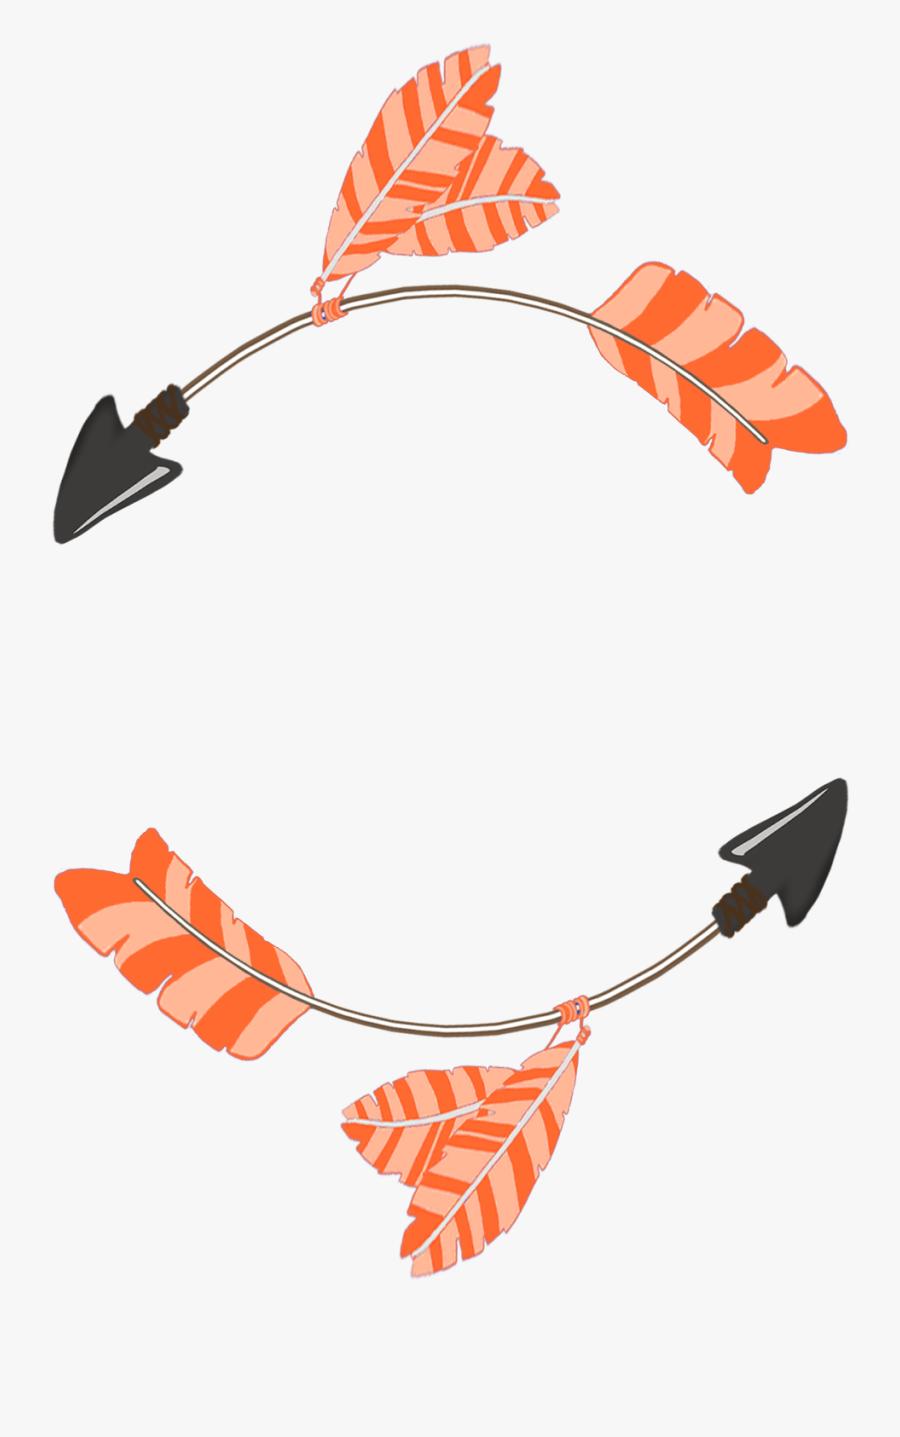 Feather Clipart Tribal Arrow - Feather Arrows Clipart Circle, Transparent Clipart